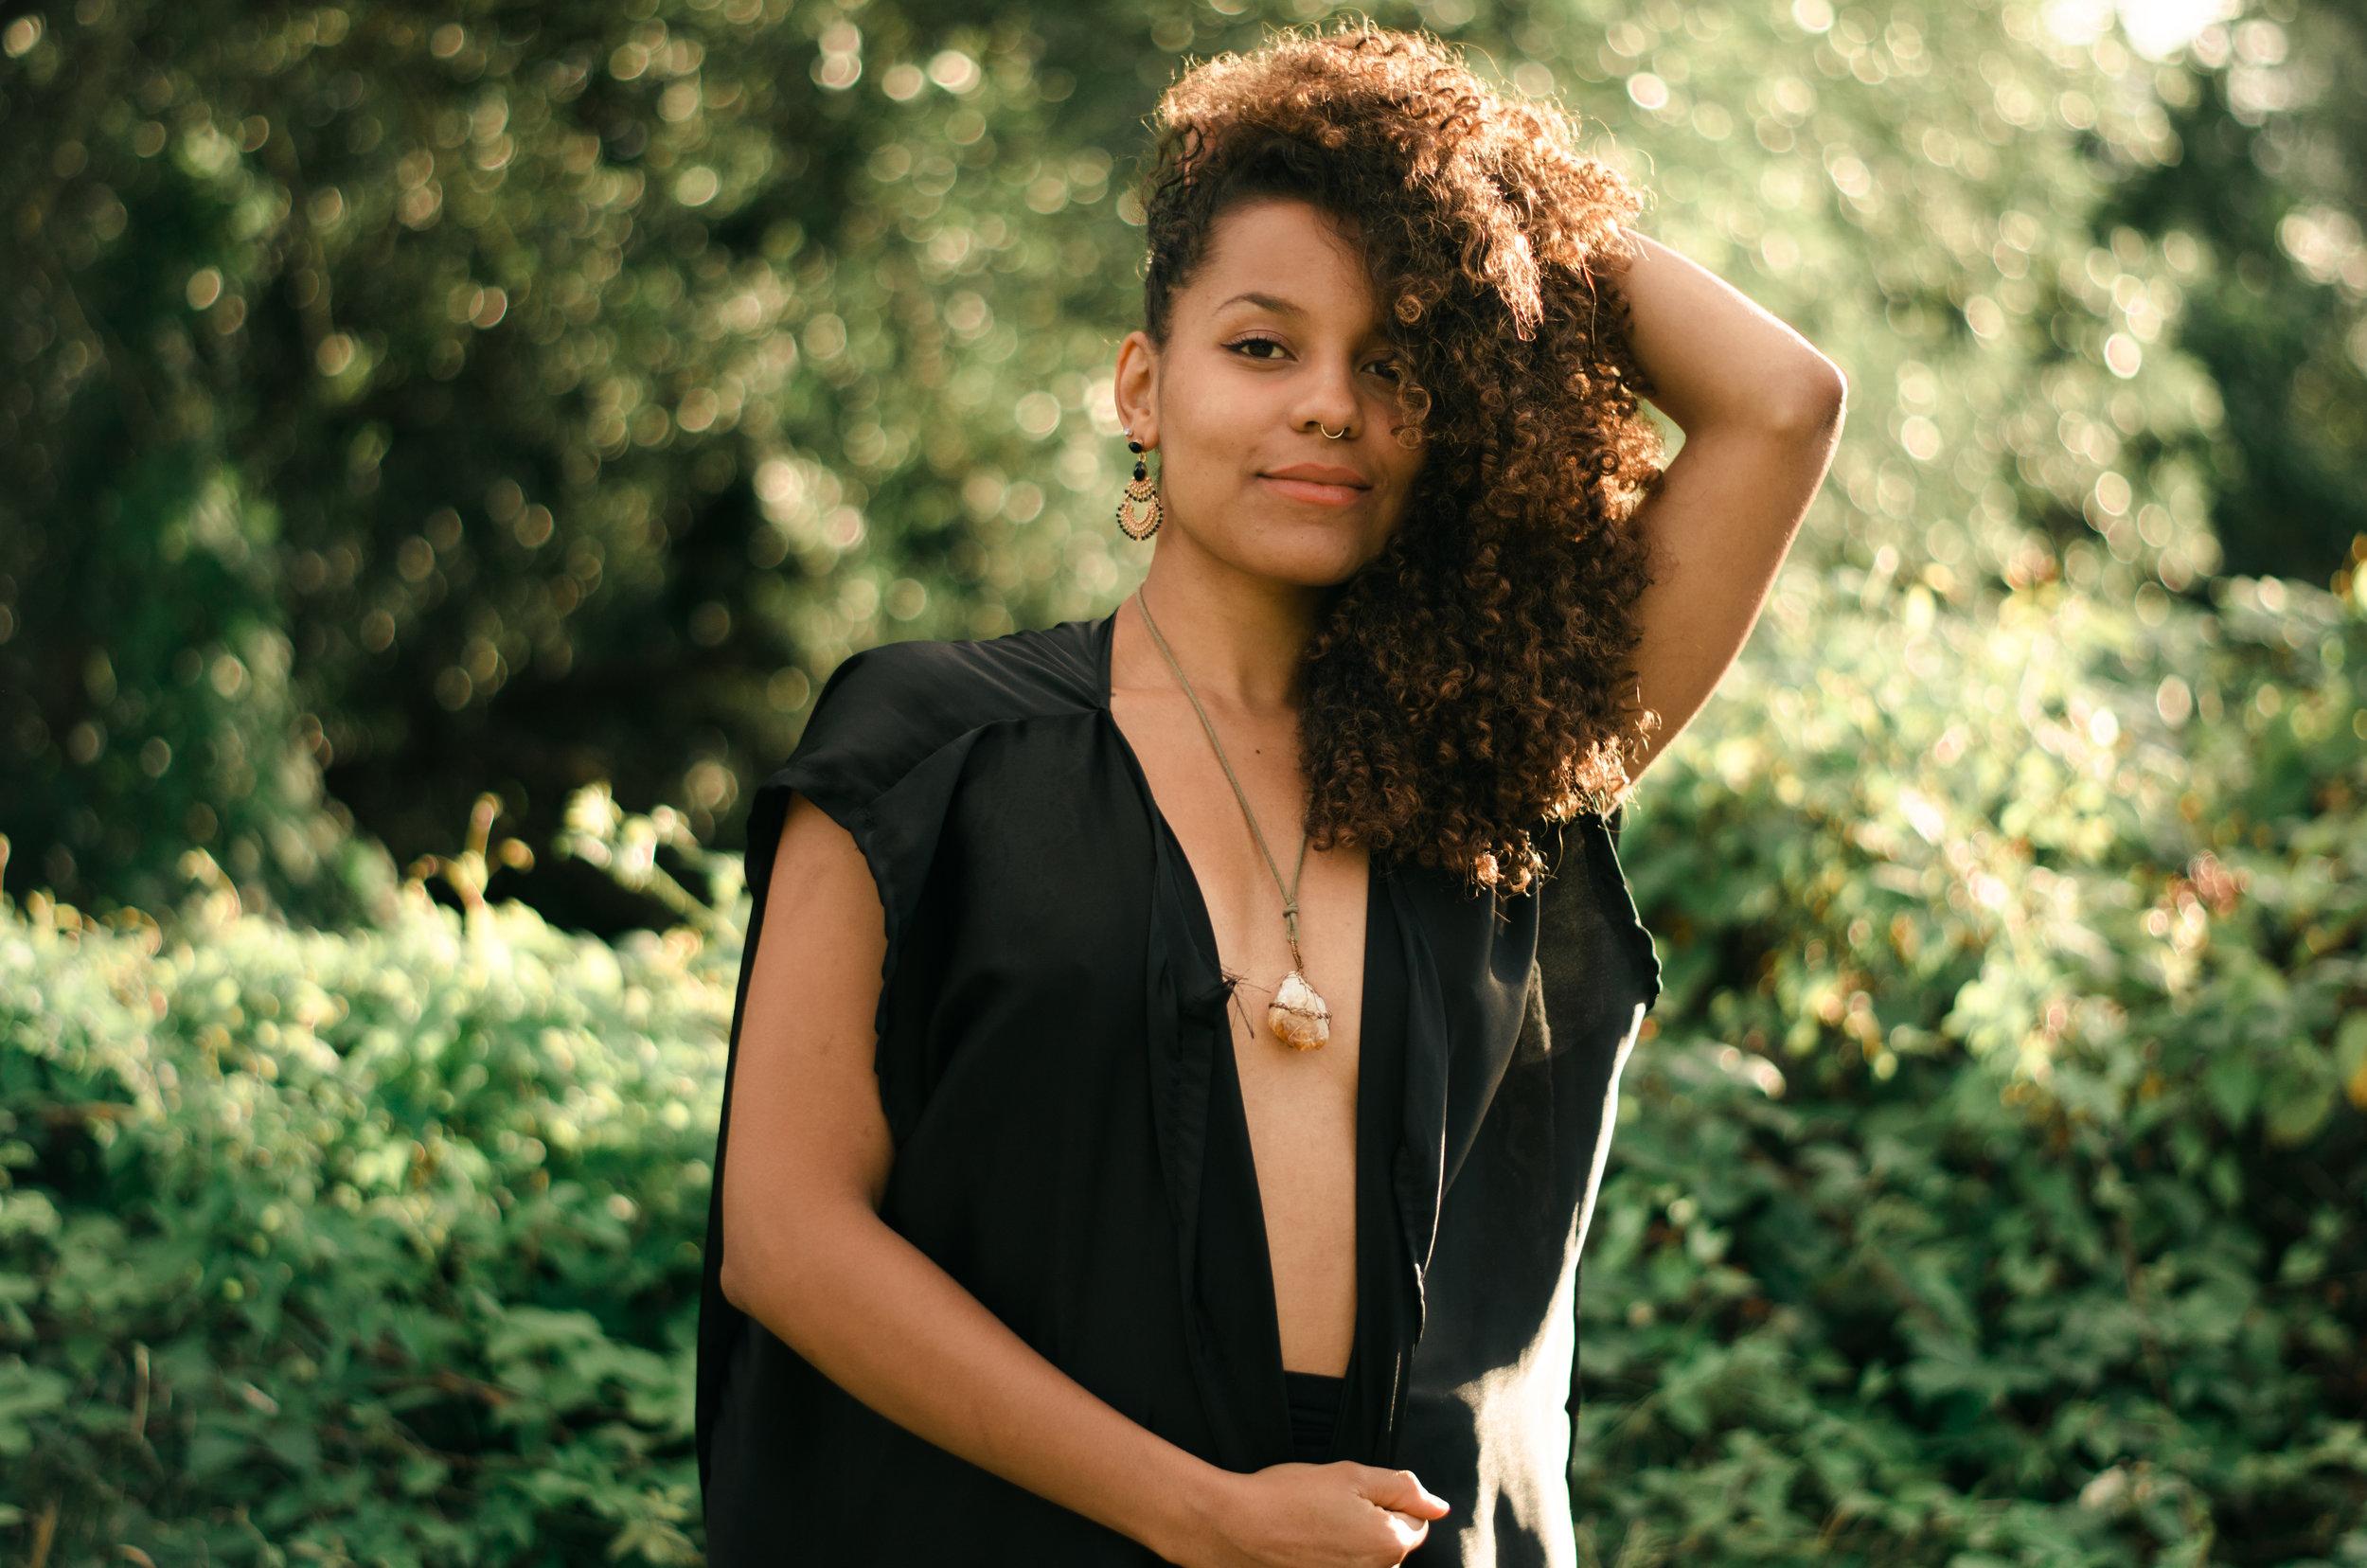 Inka-Portrait-Session-Aiste-Saulyte-Photography-17-07-30-210.jpg